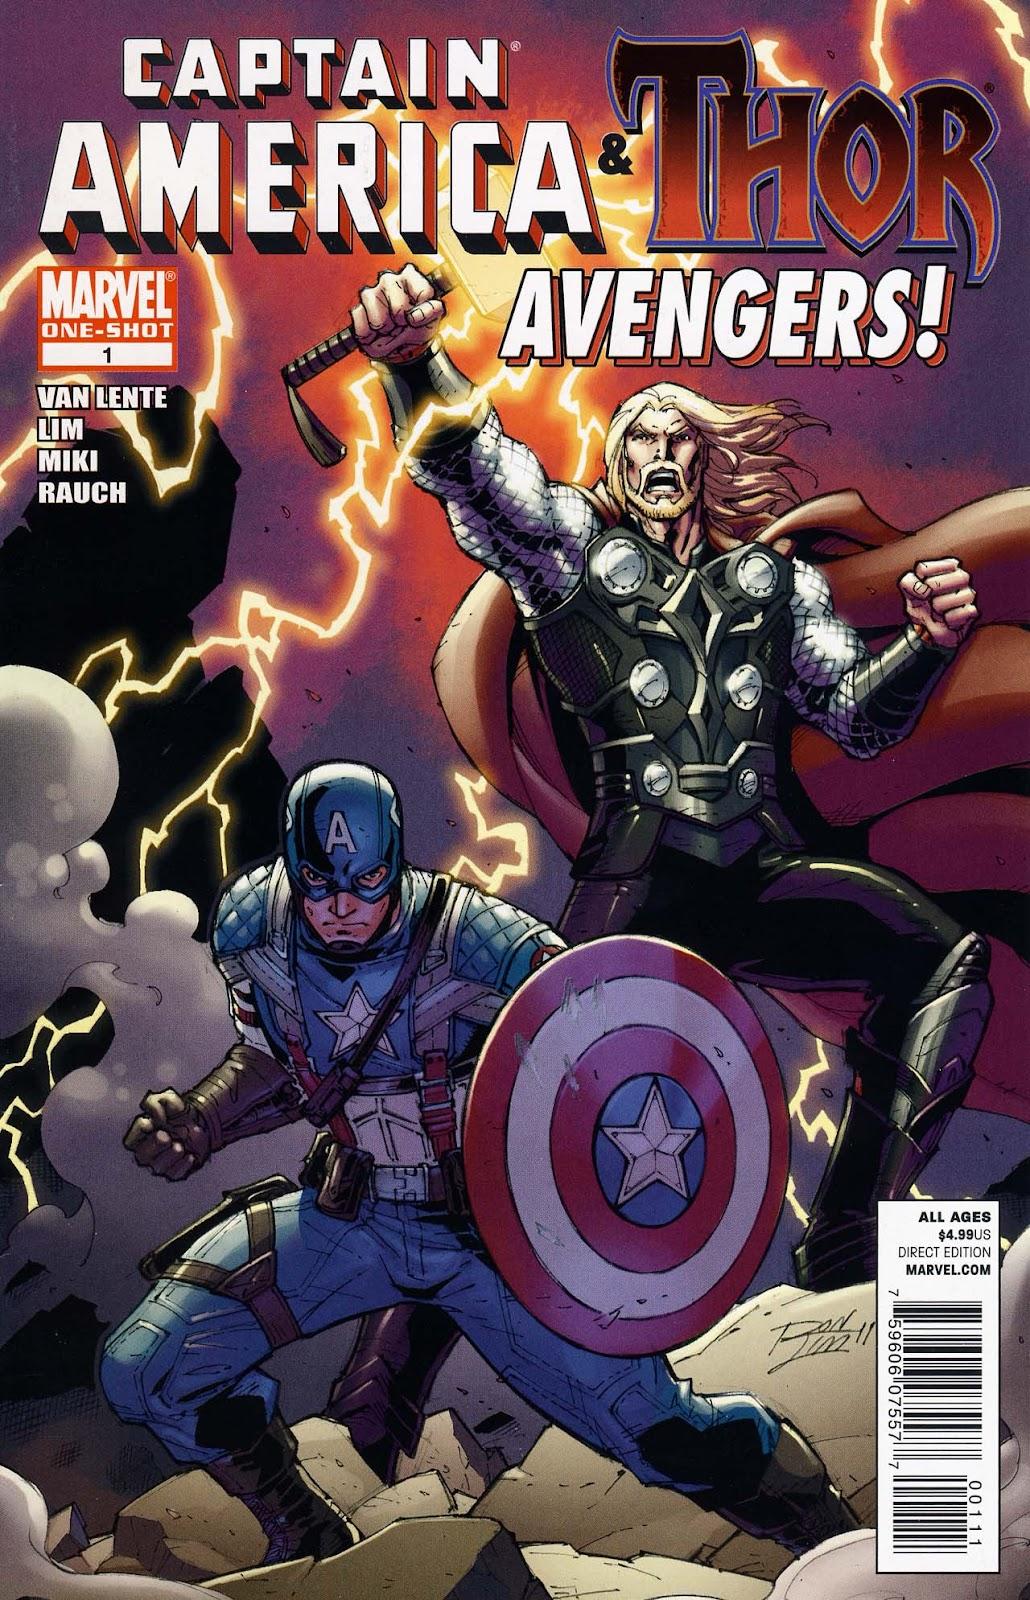 Captain America & Thor: Avengers Full Page 1